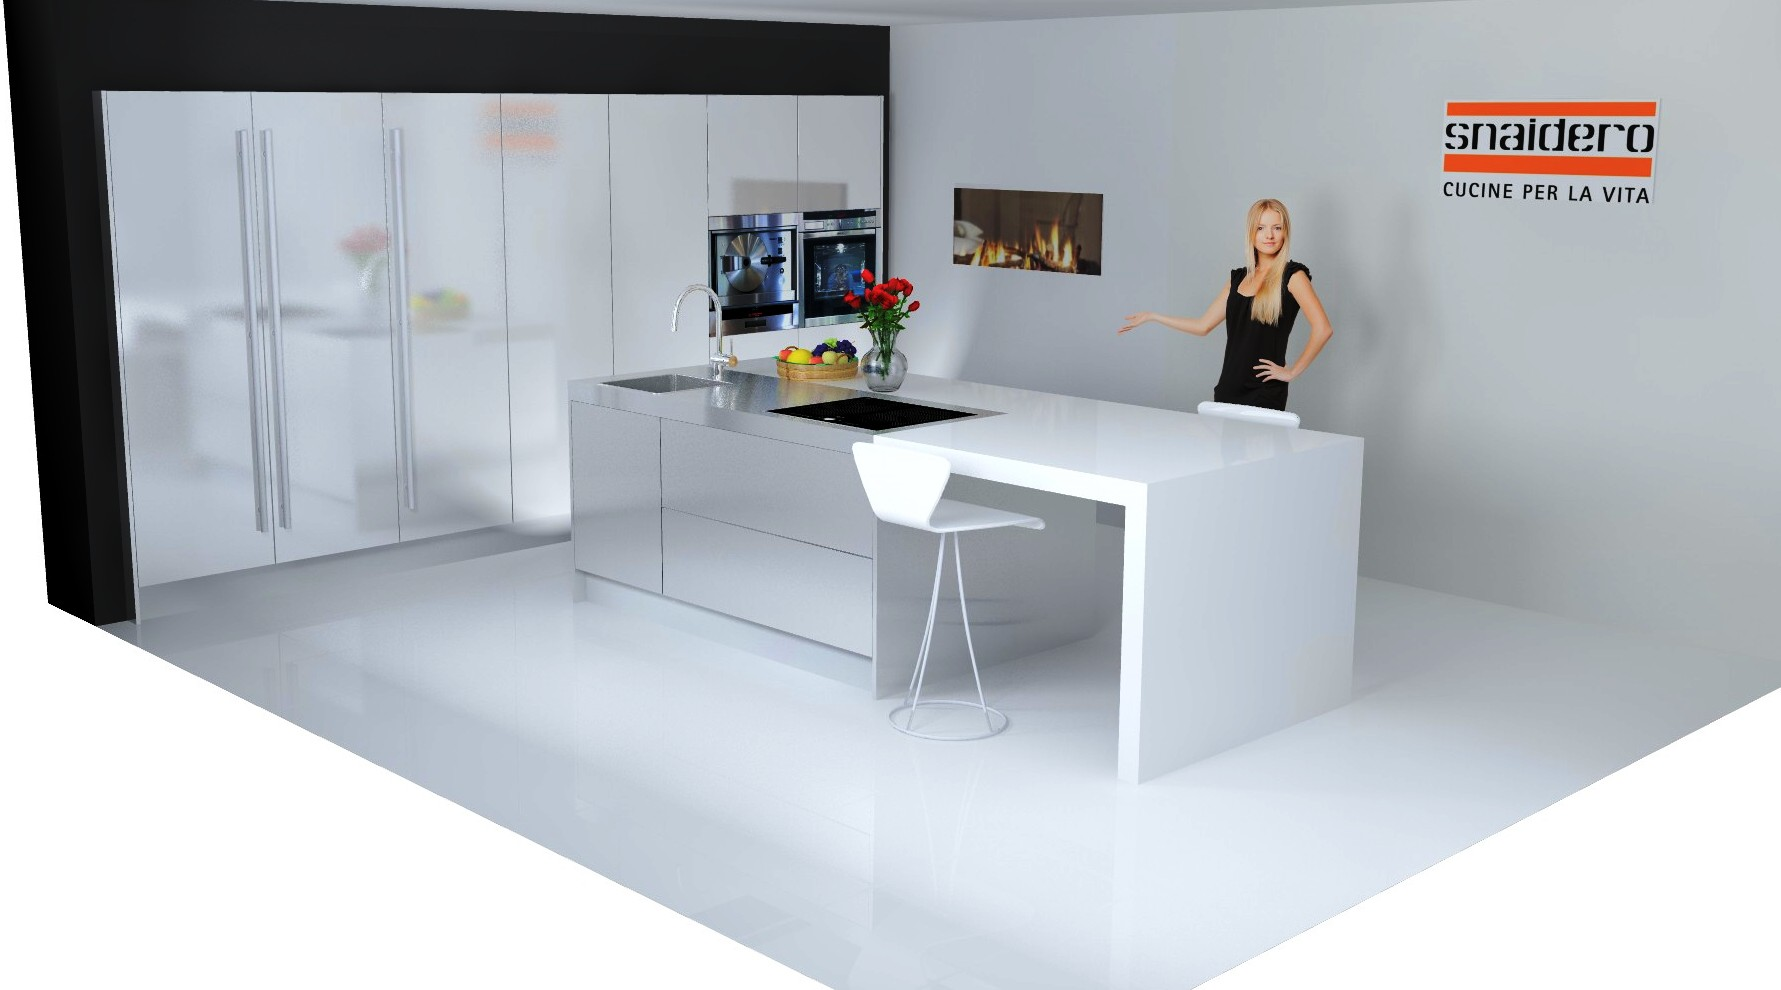 Inox Design Keukens : Snaidero concept store stijlvolle designkeukens italiaans